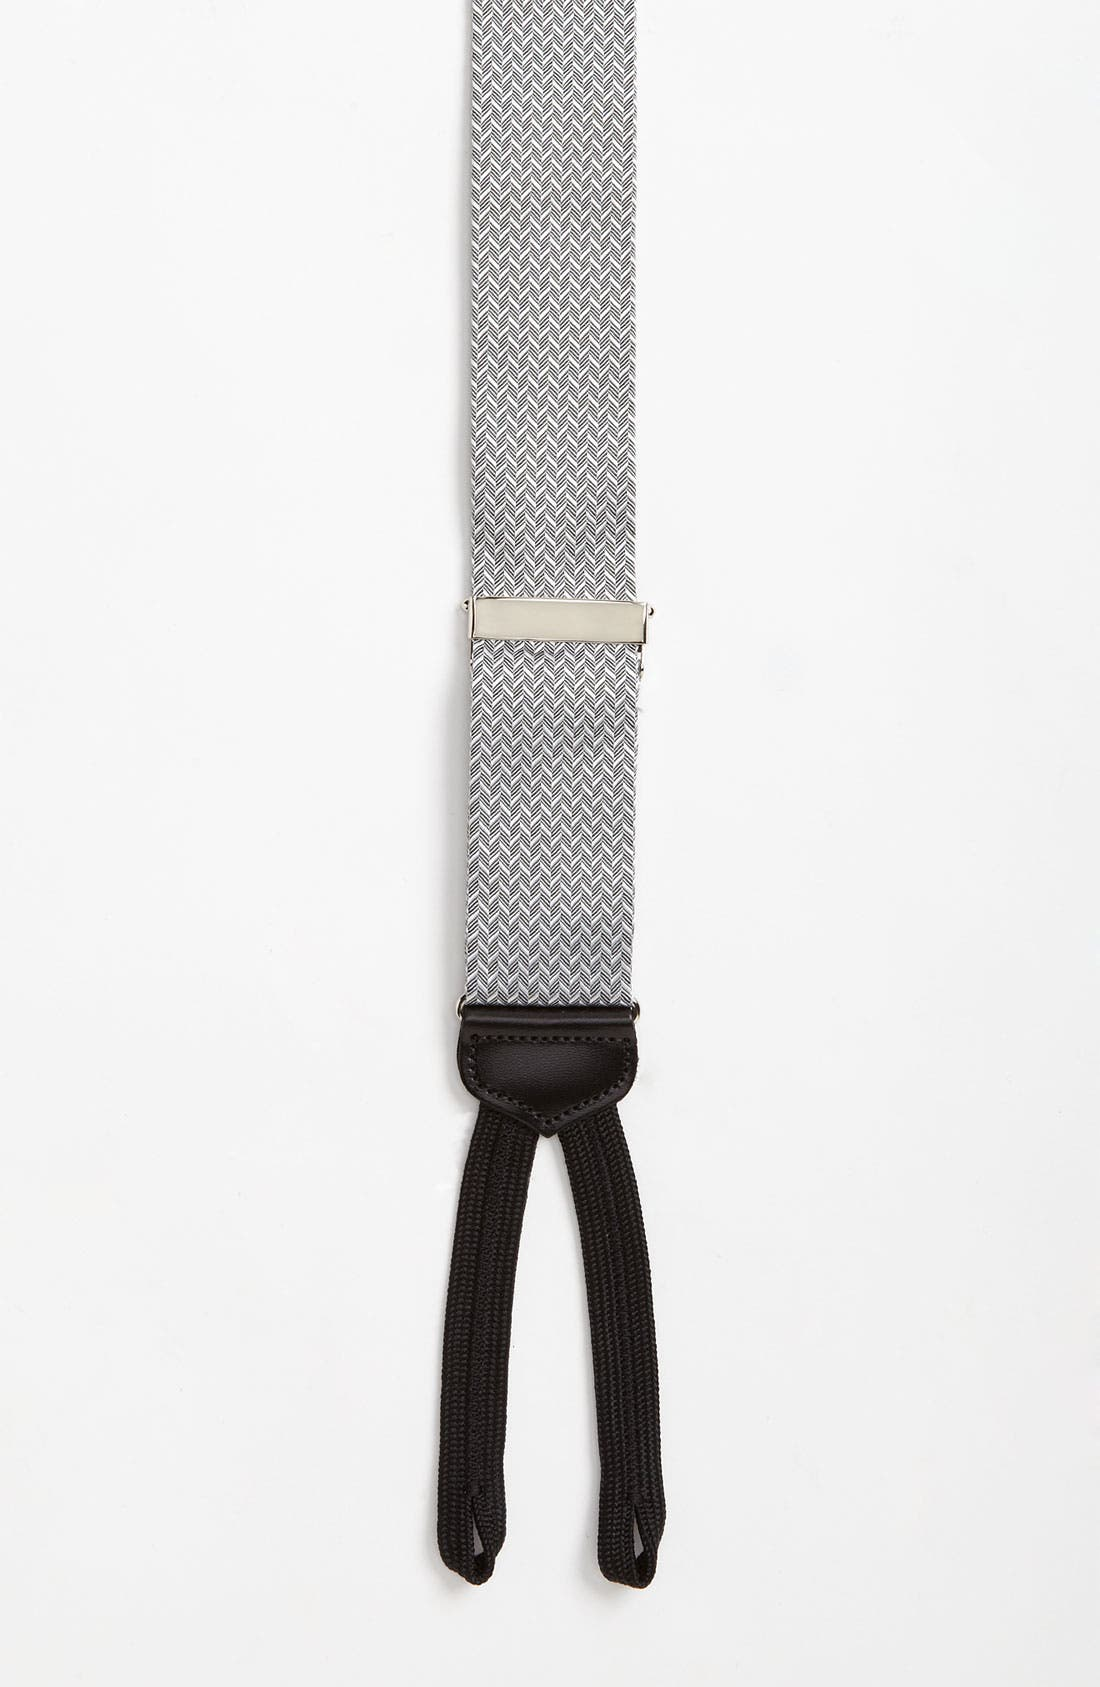 TRAFALGAR 'Southwick' Formal Suspenders